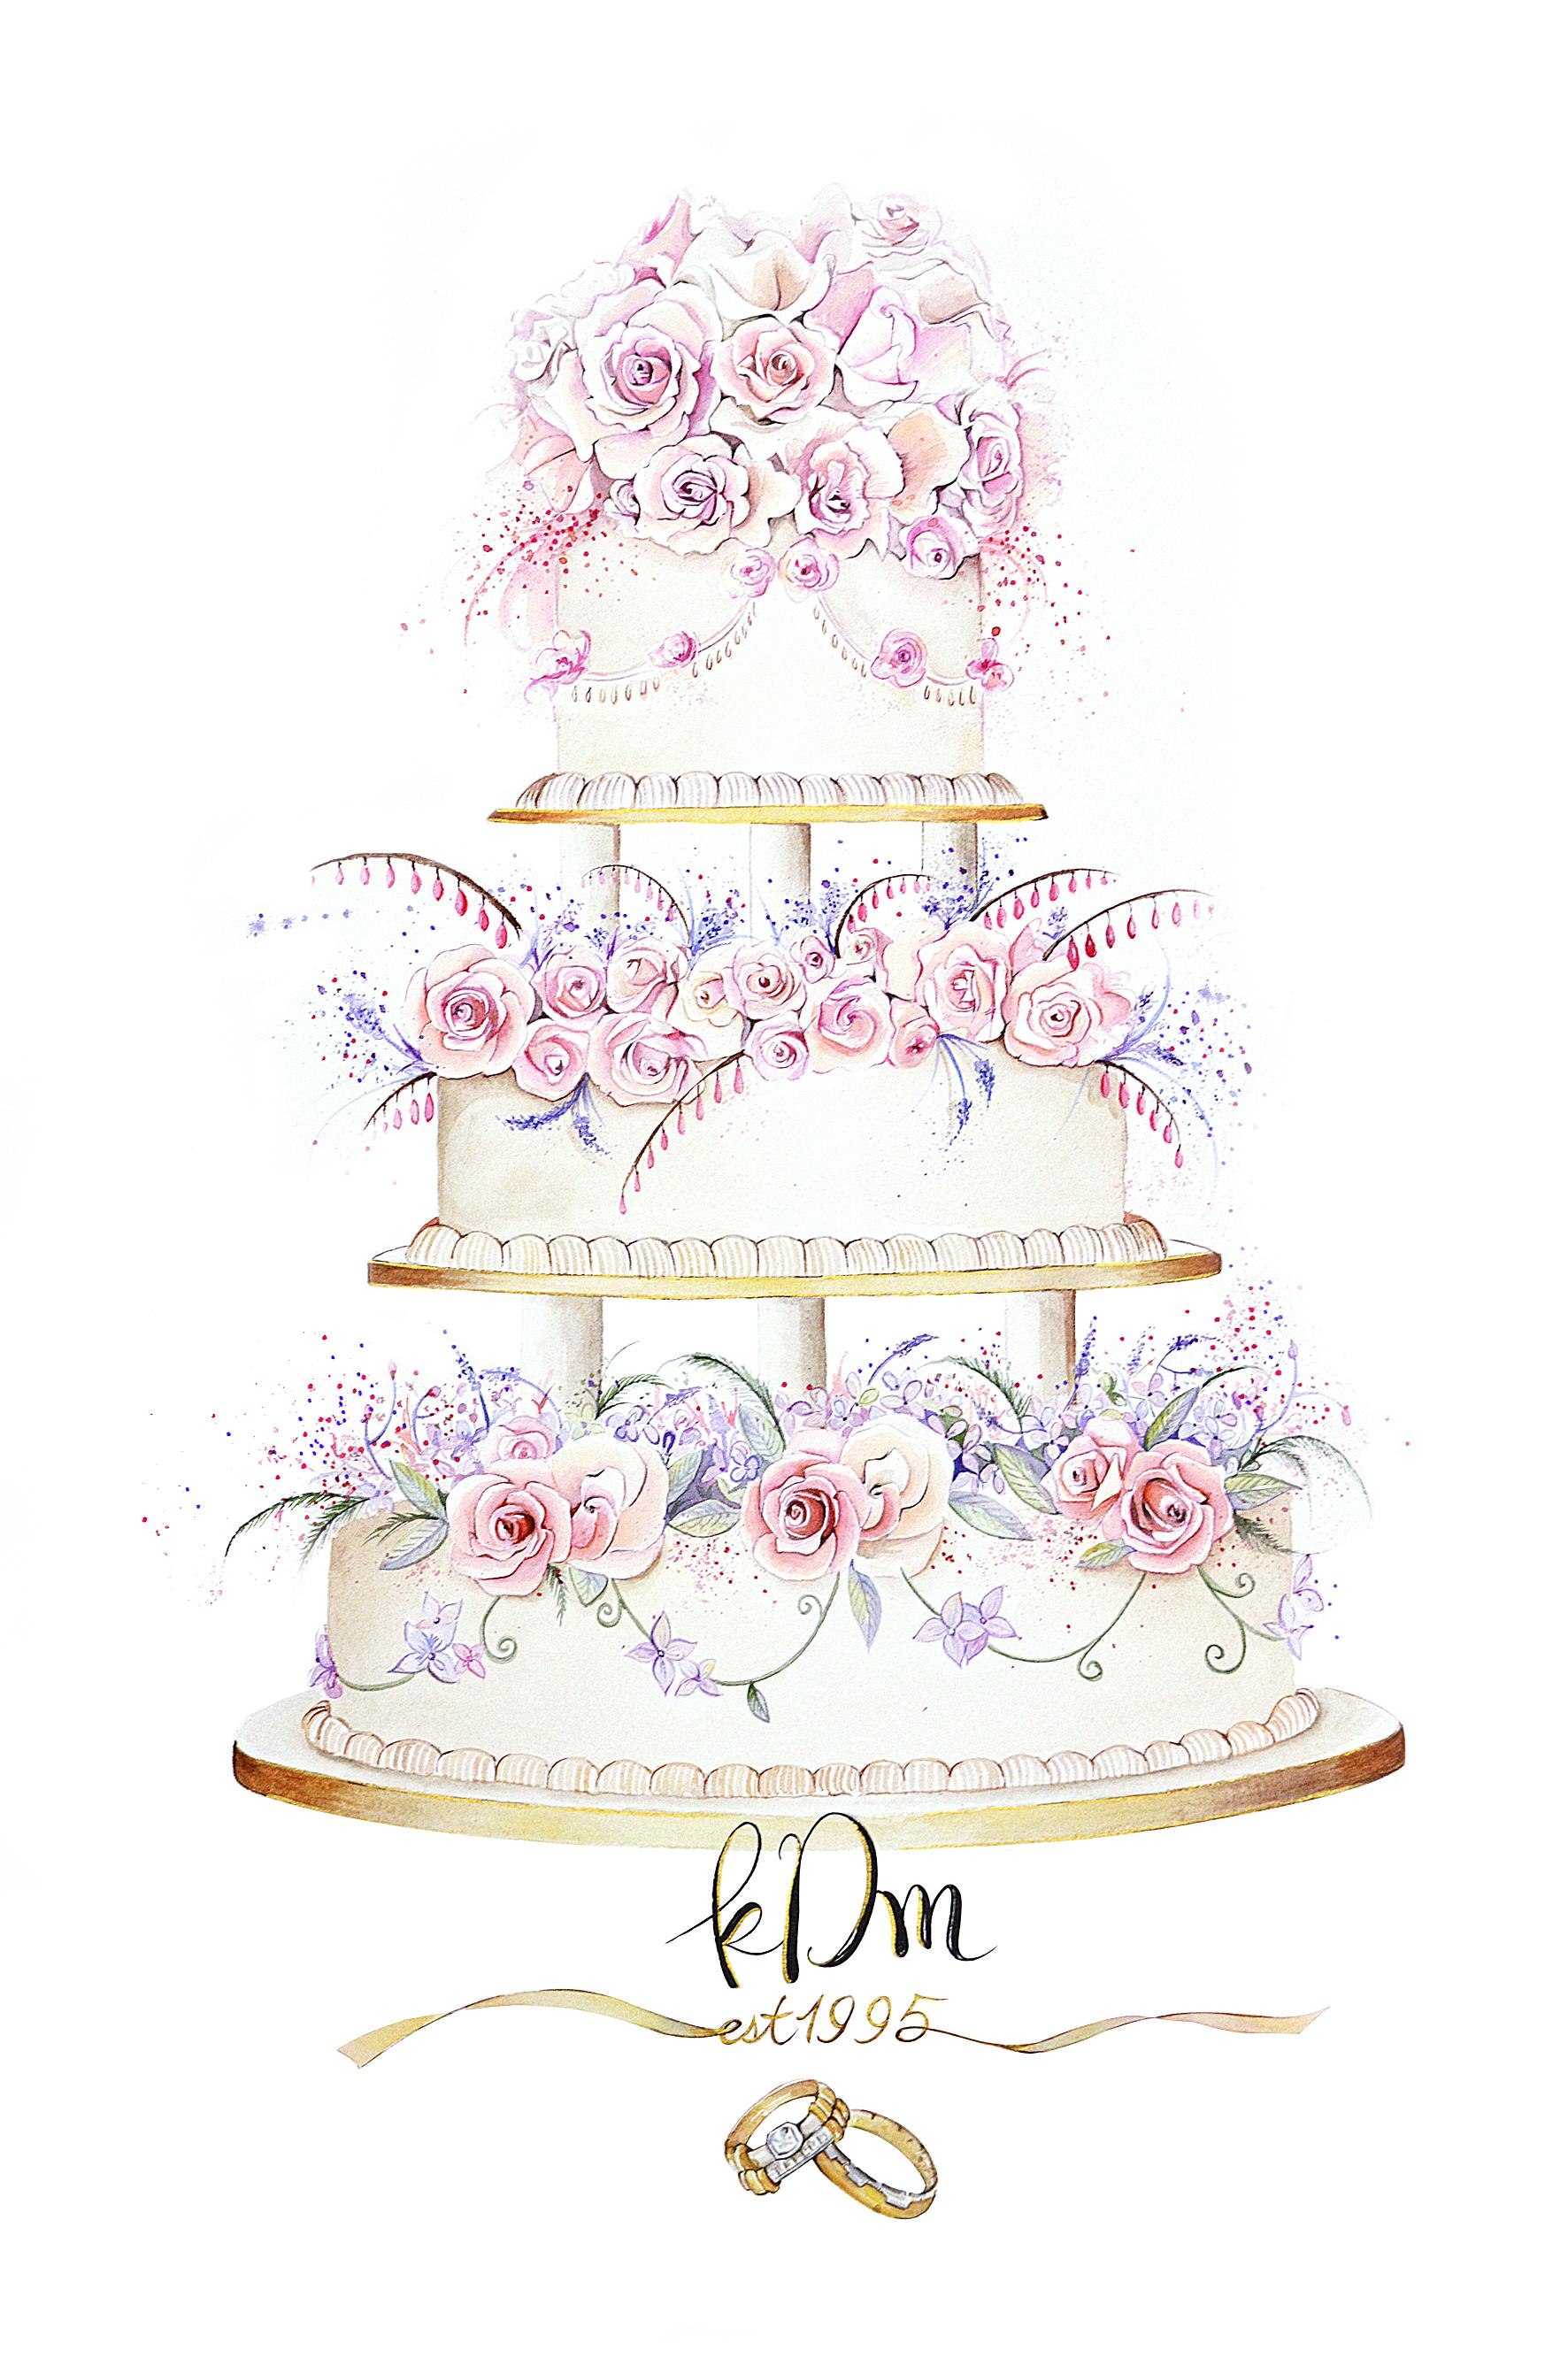 A2 size wedding cake